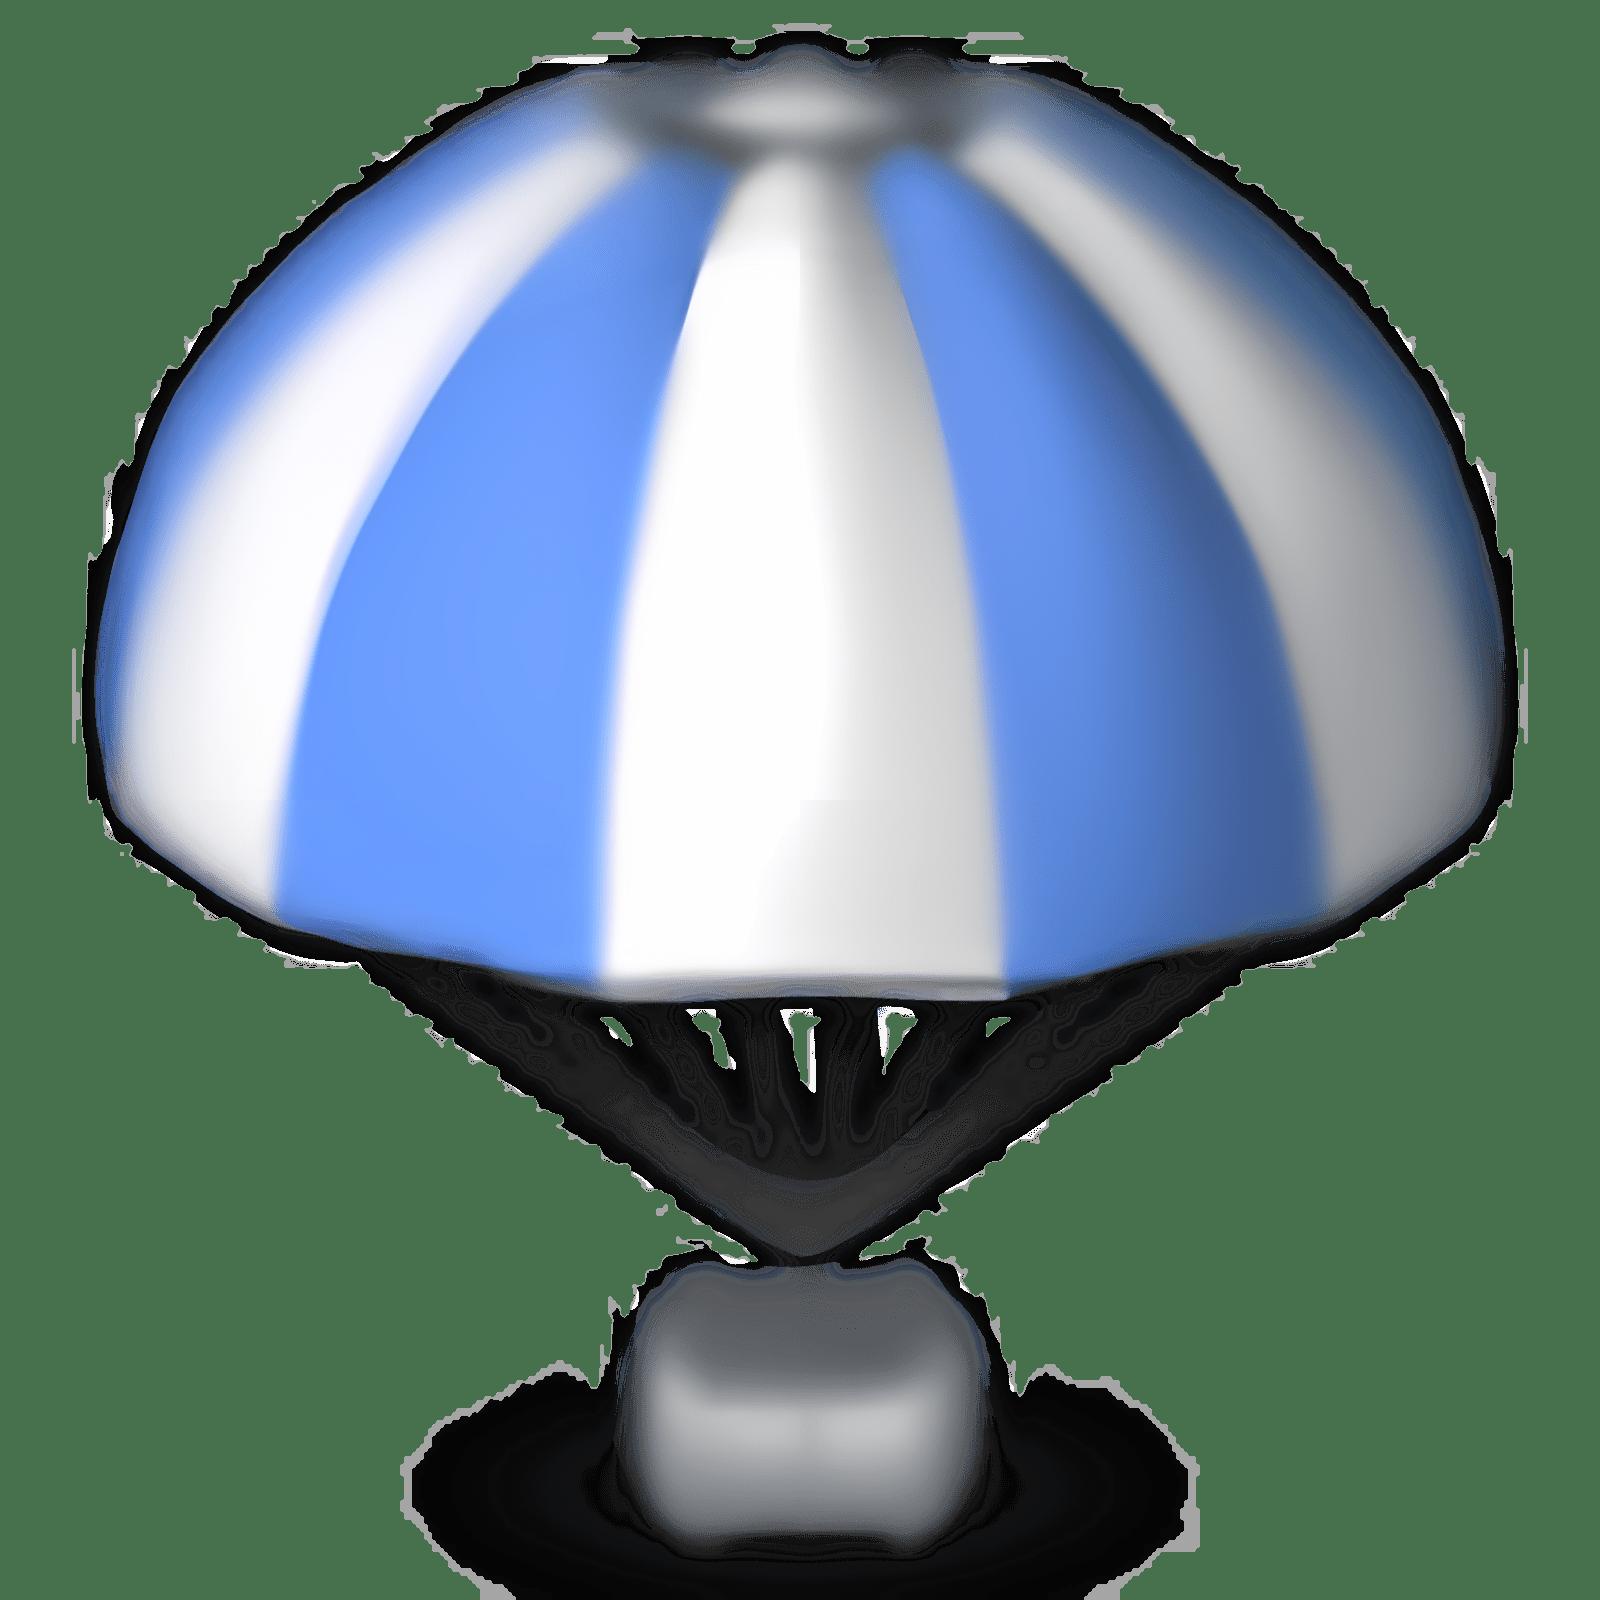 Parachute 1.1.0